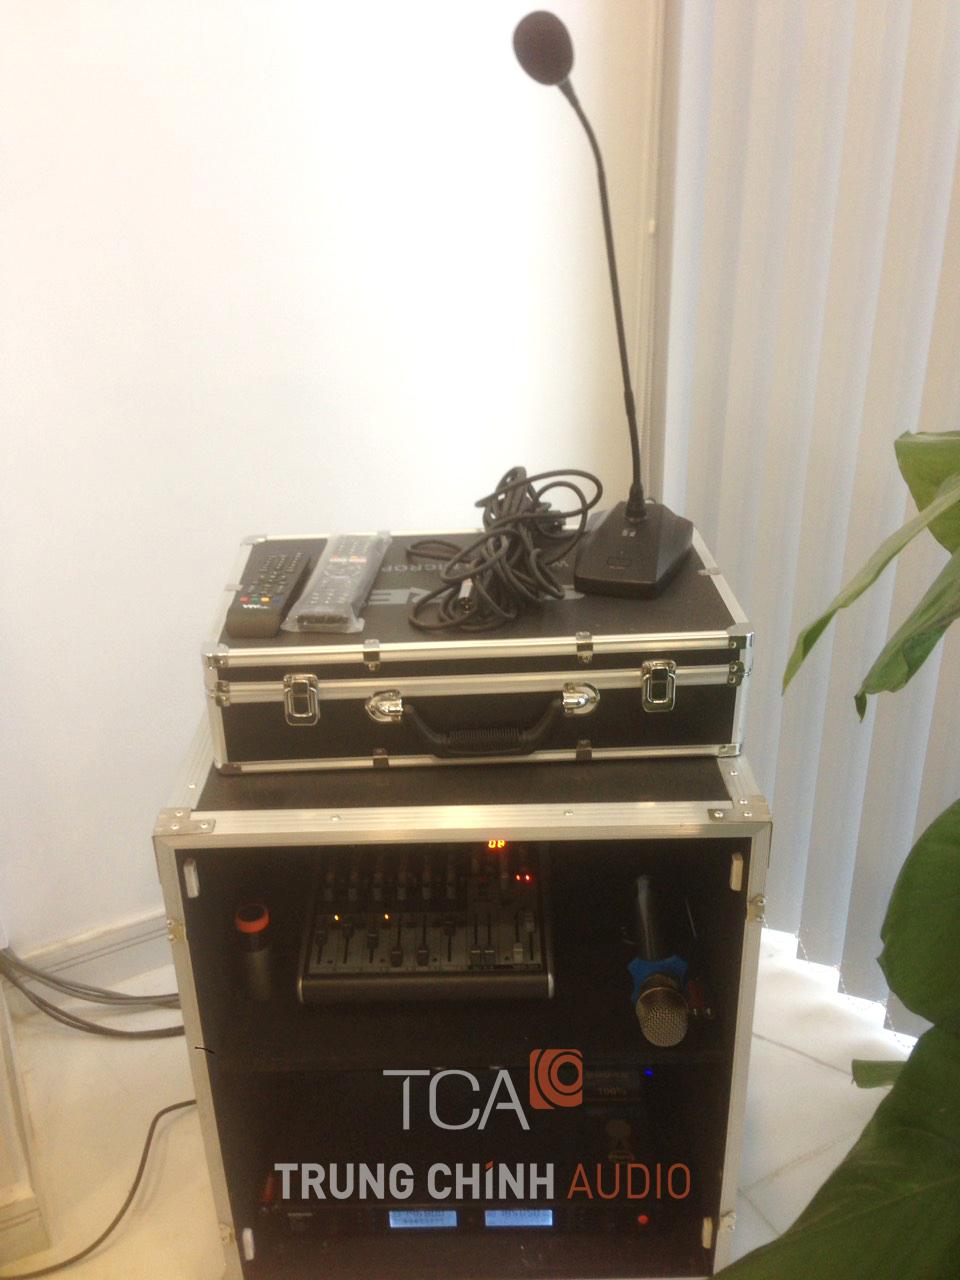 tca-lap-dat-am-thanh-tap-doan-xang-dau-petrolimex-004